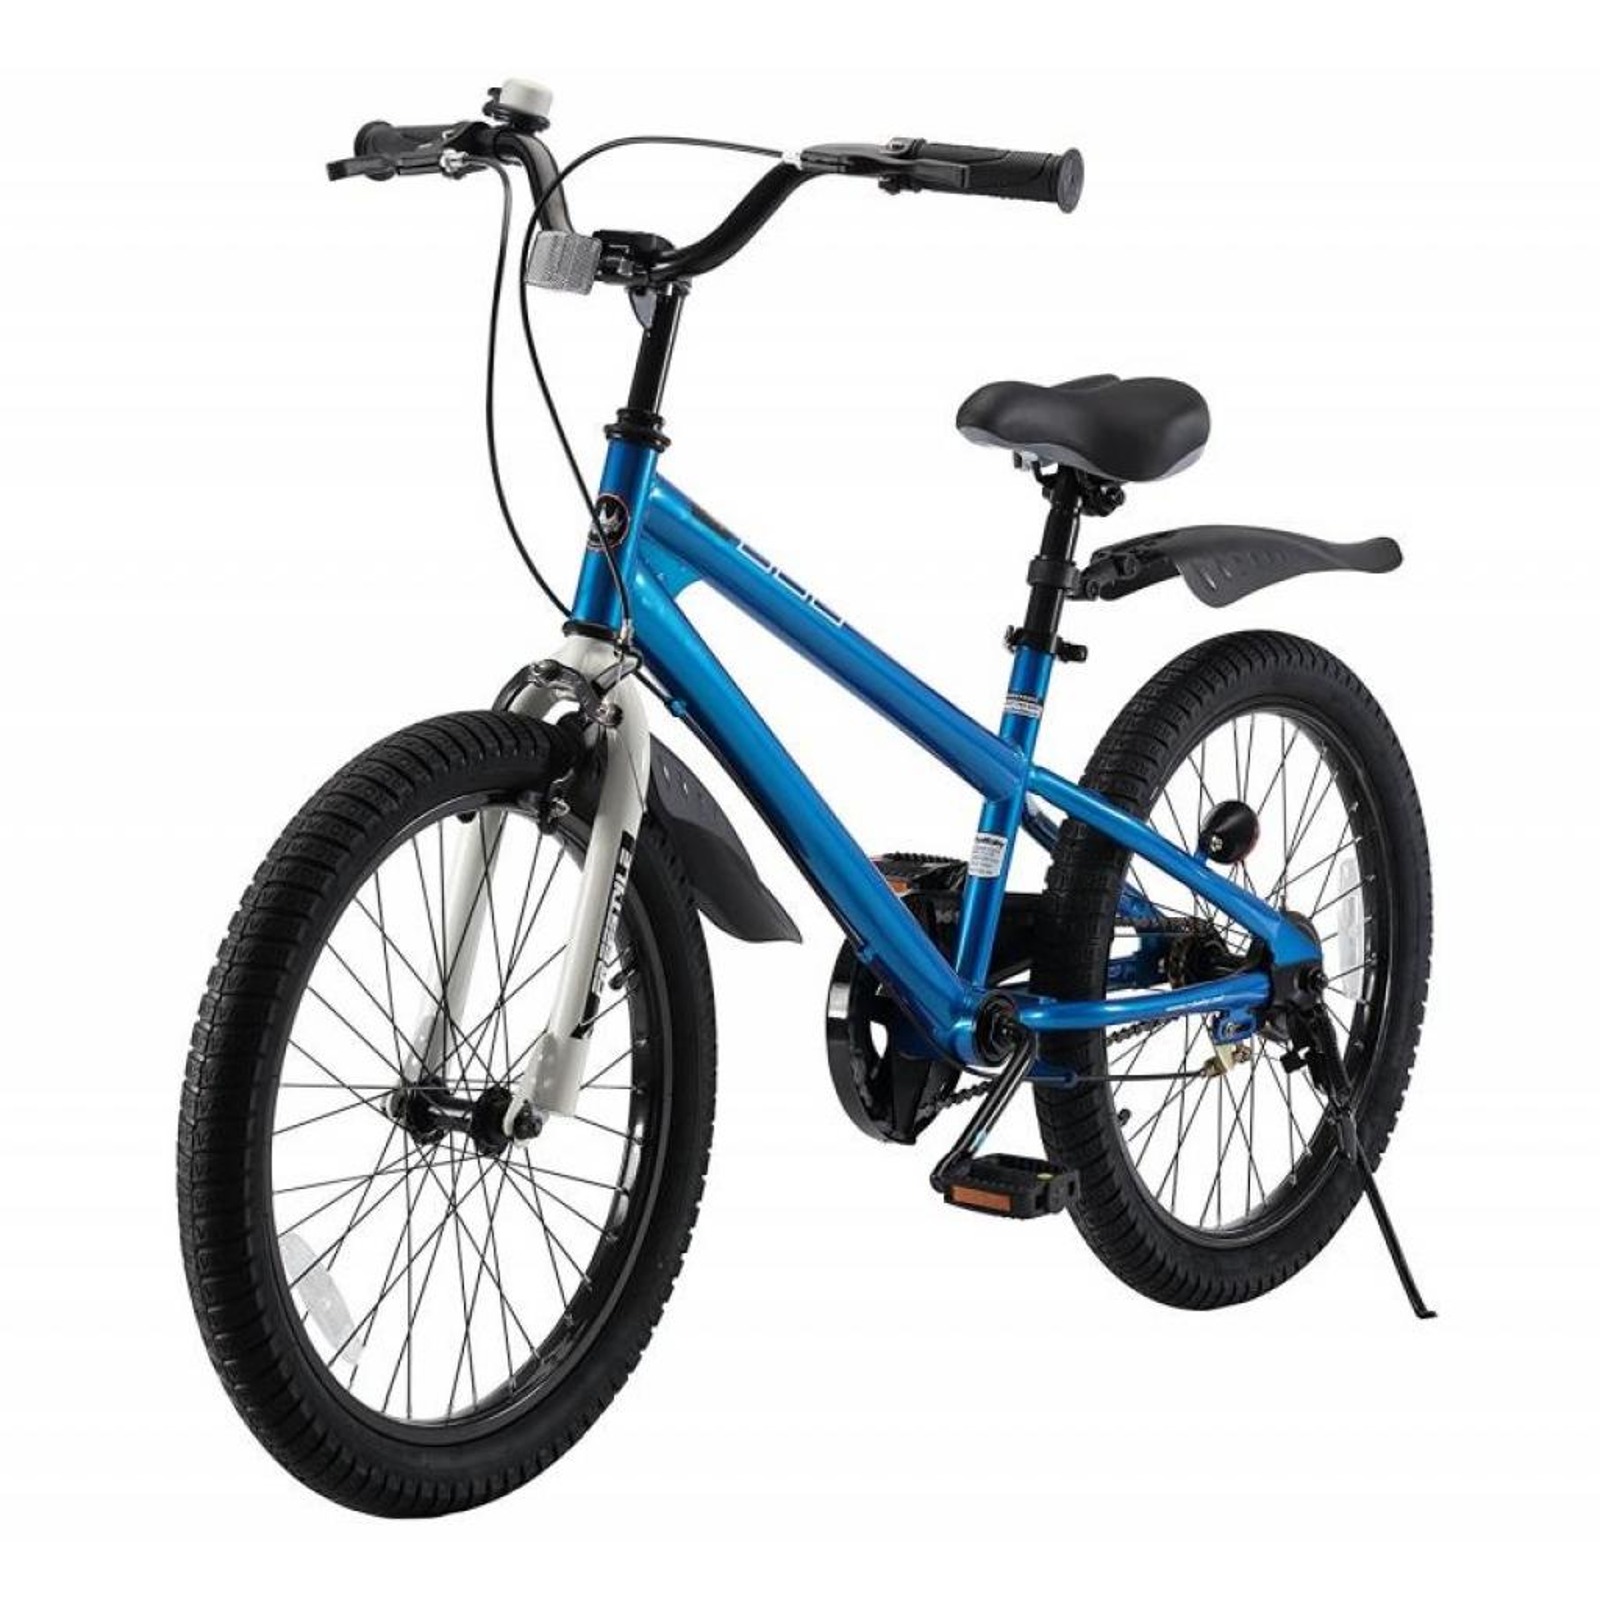 "Велосипед Royal Baby FREESTYLE 20"", синий (RB20B-6-BLU) изображение 4"